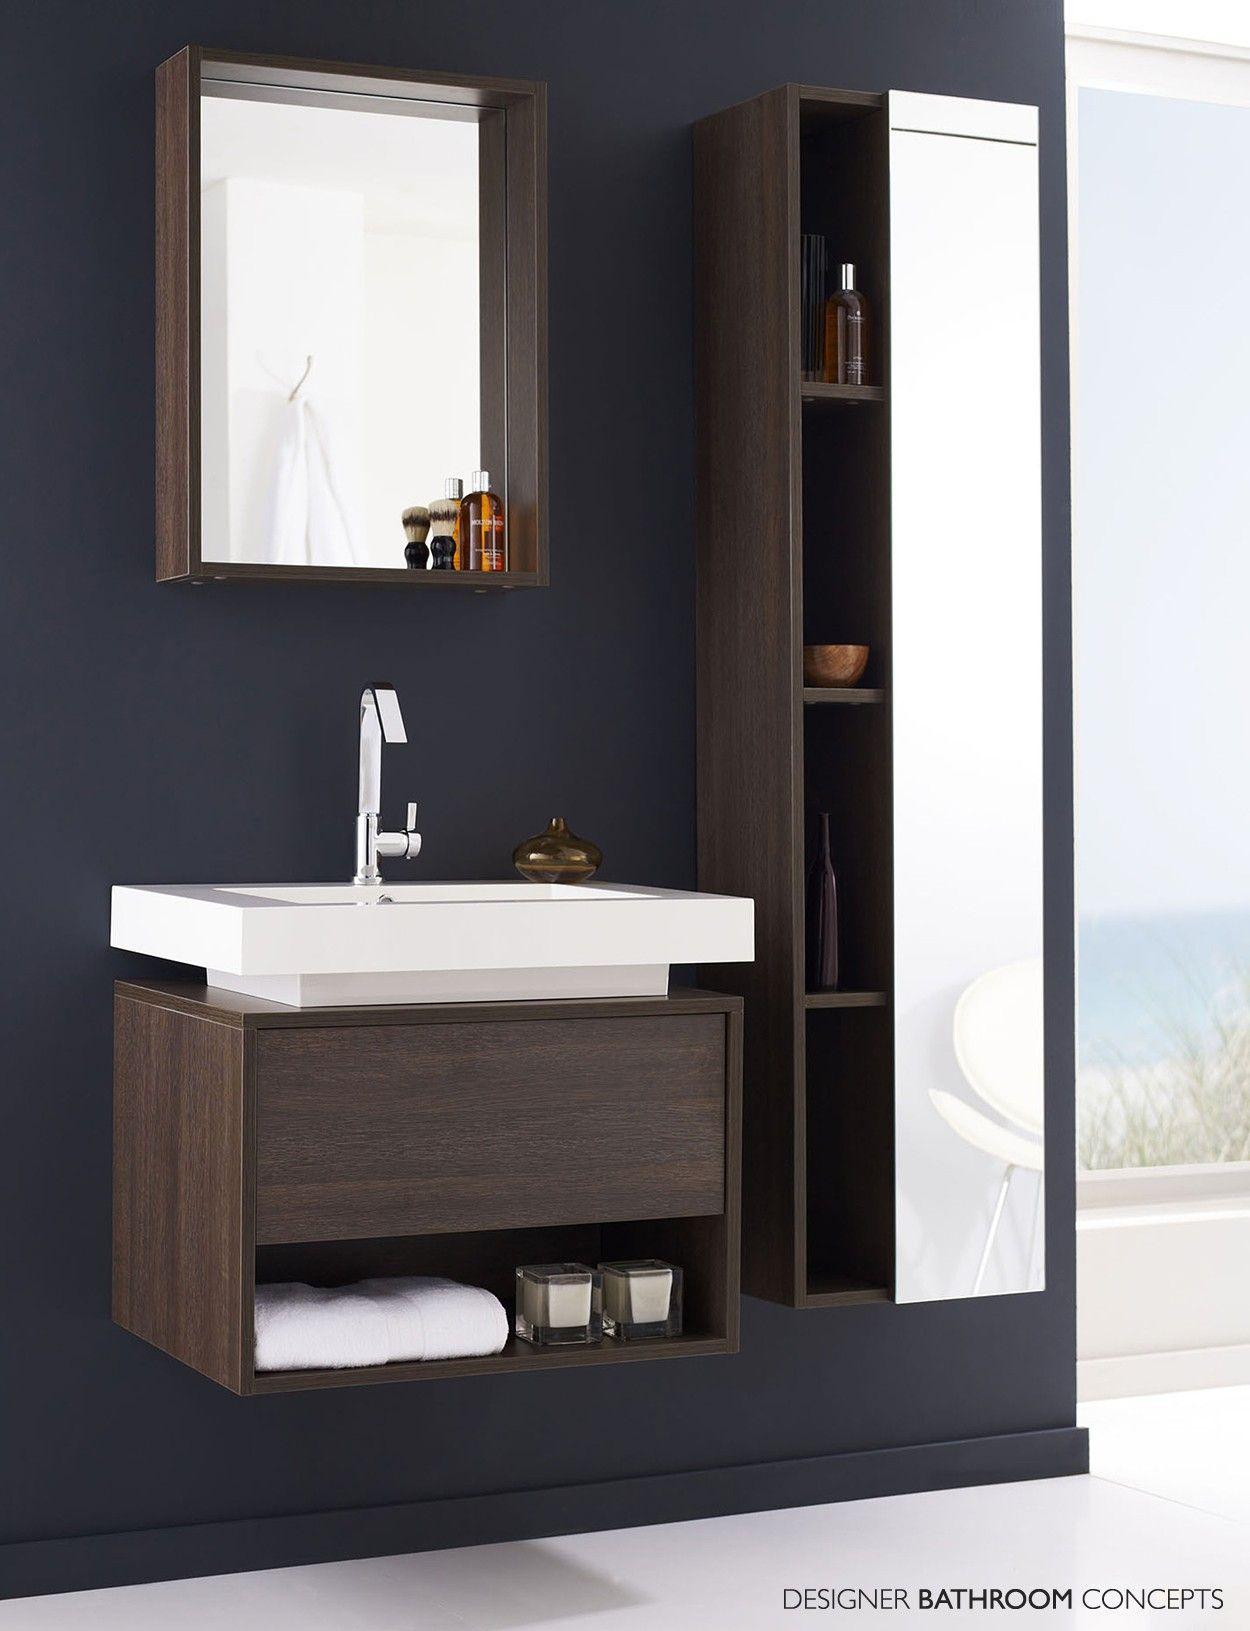 47 Awesome Bathroom Storage Cabinet Design Ideas For Small Spaces Bathroom Interior Design Bathroom Cabinets